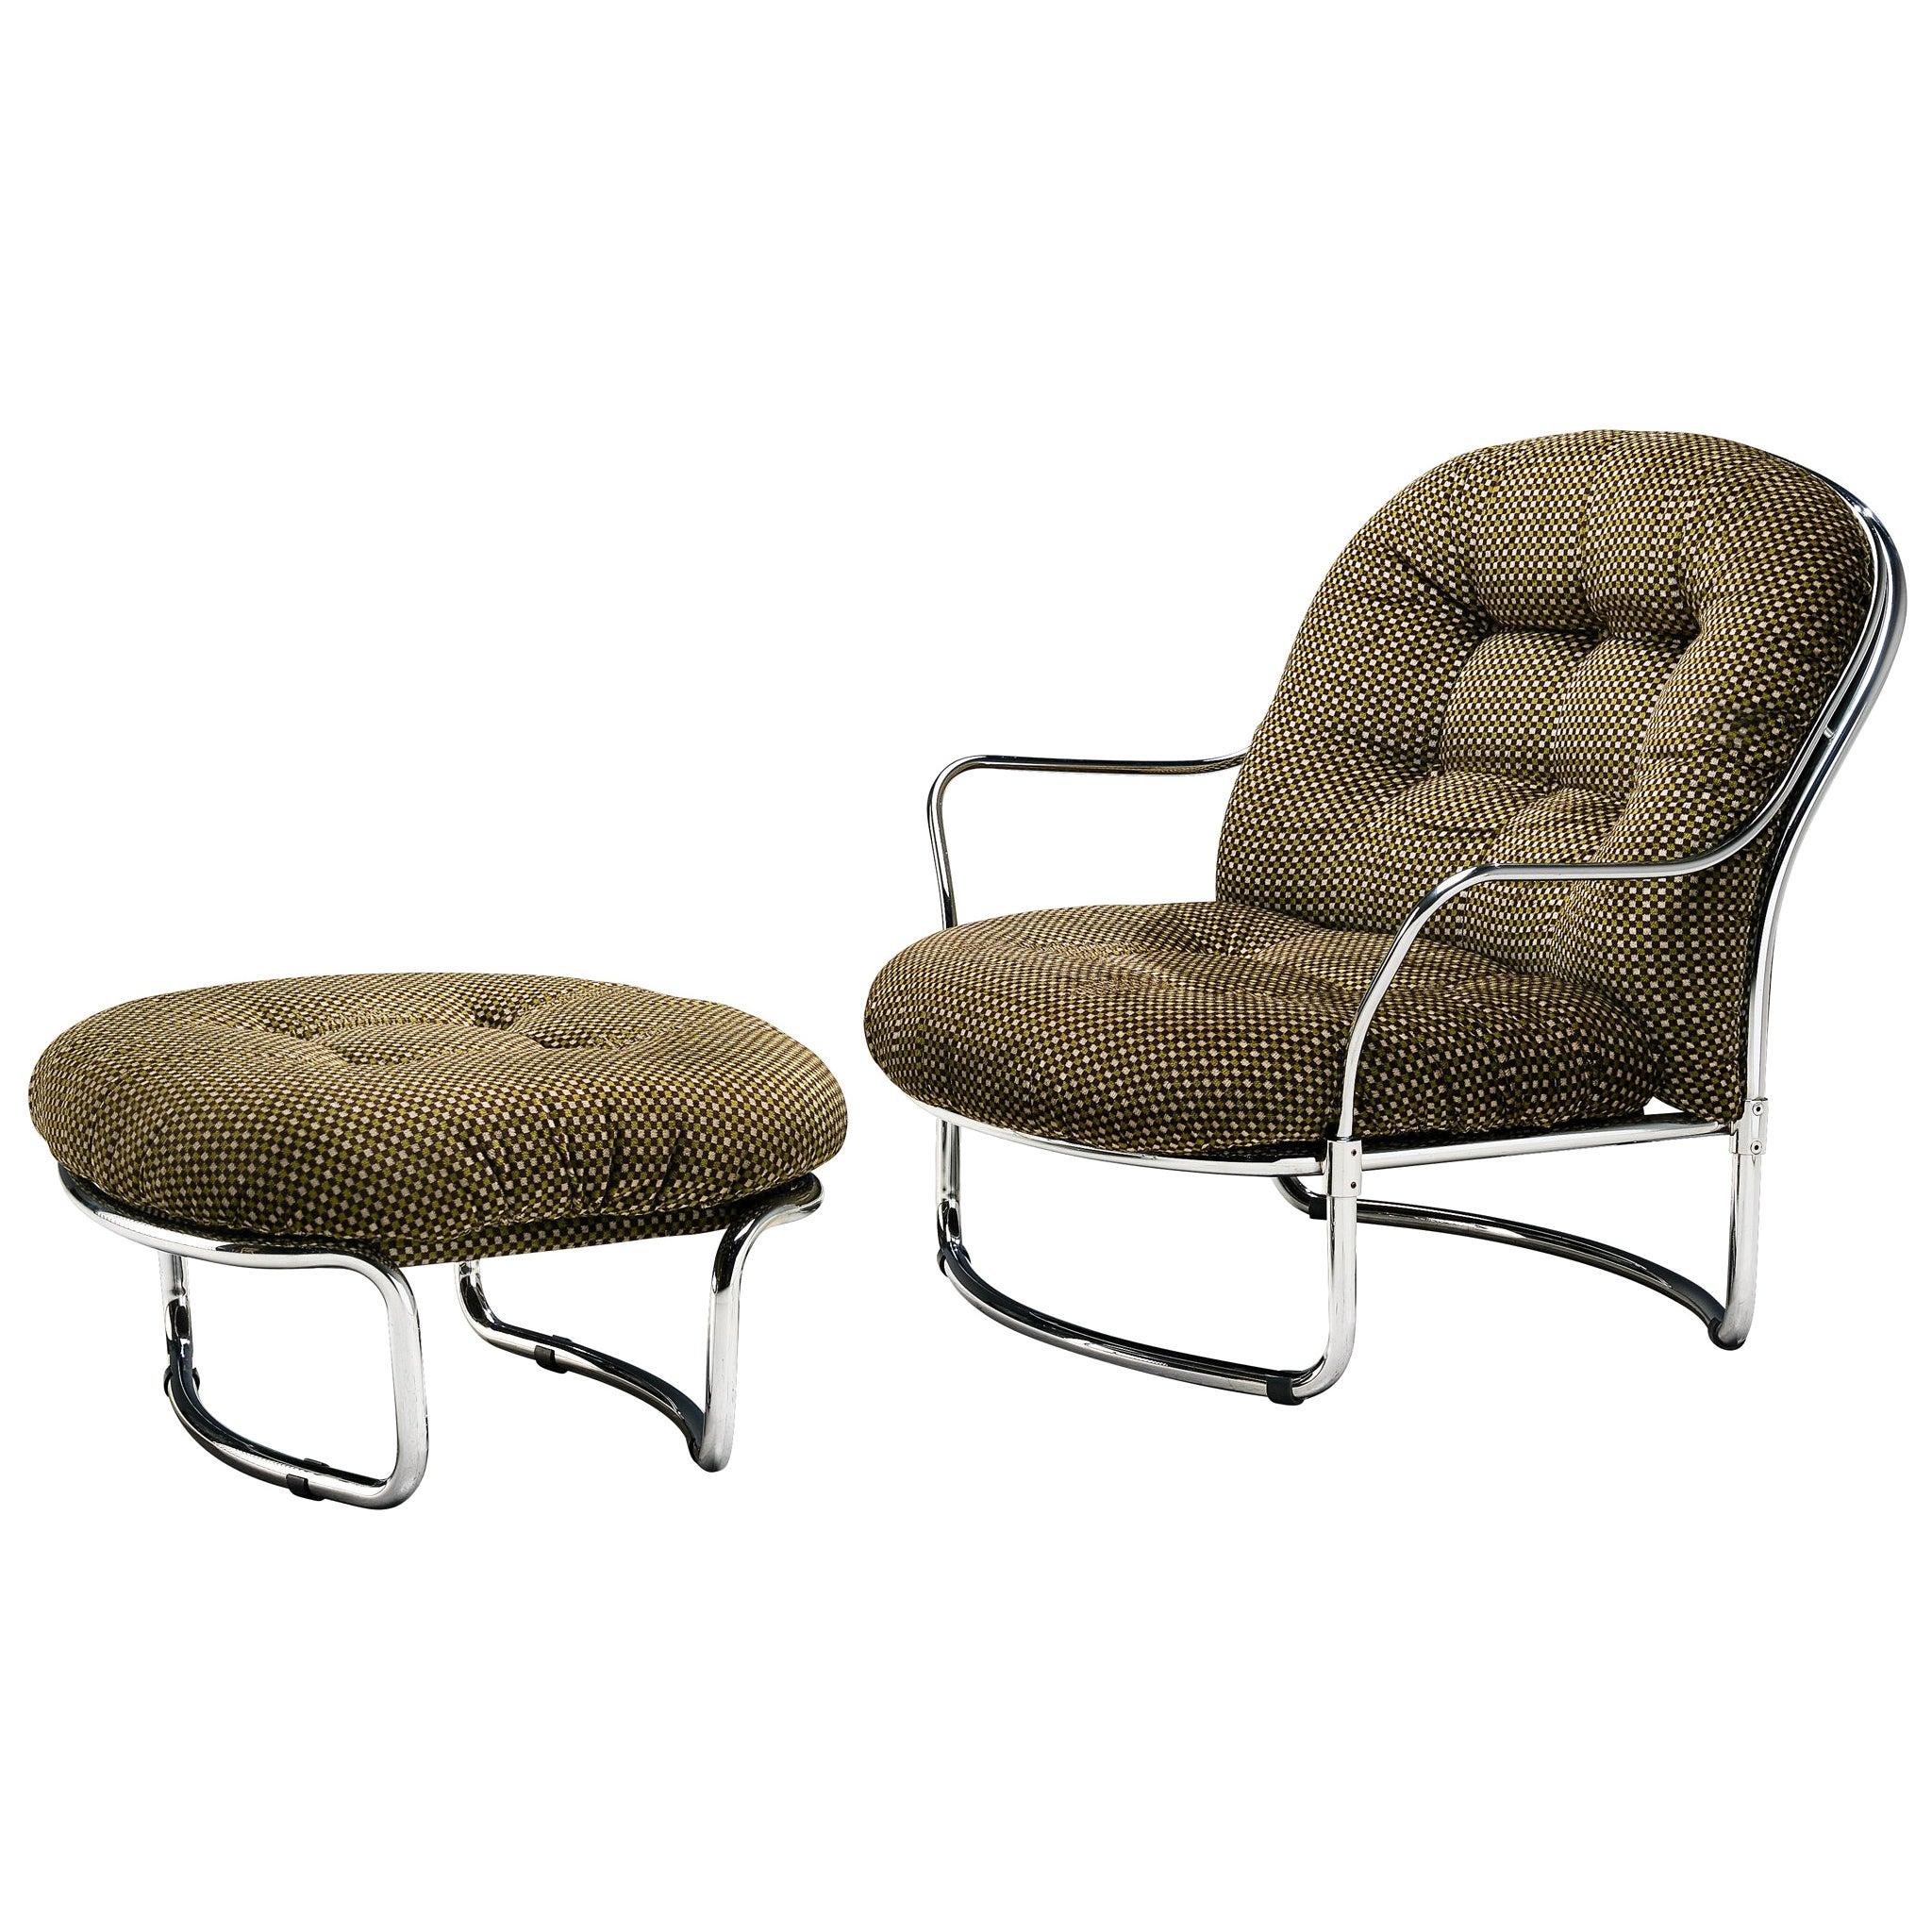 Carlo de Carli Tubular Lounge Chair with Ottoman